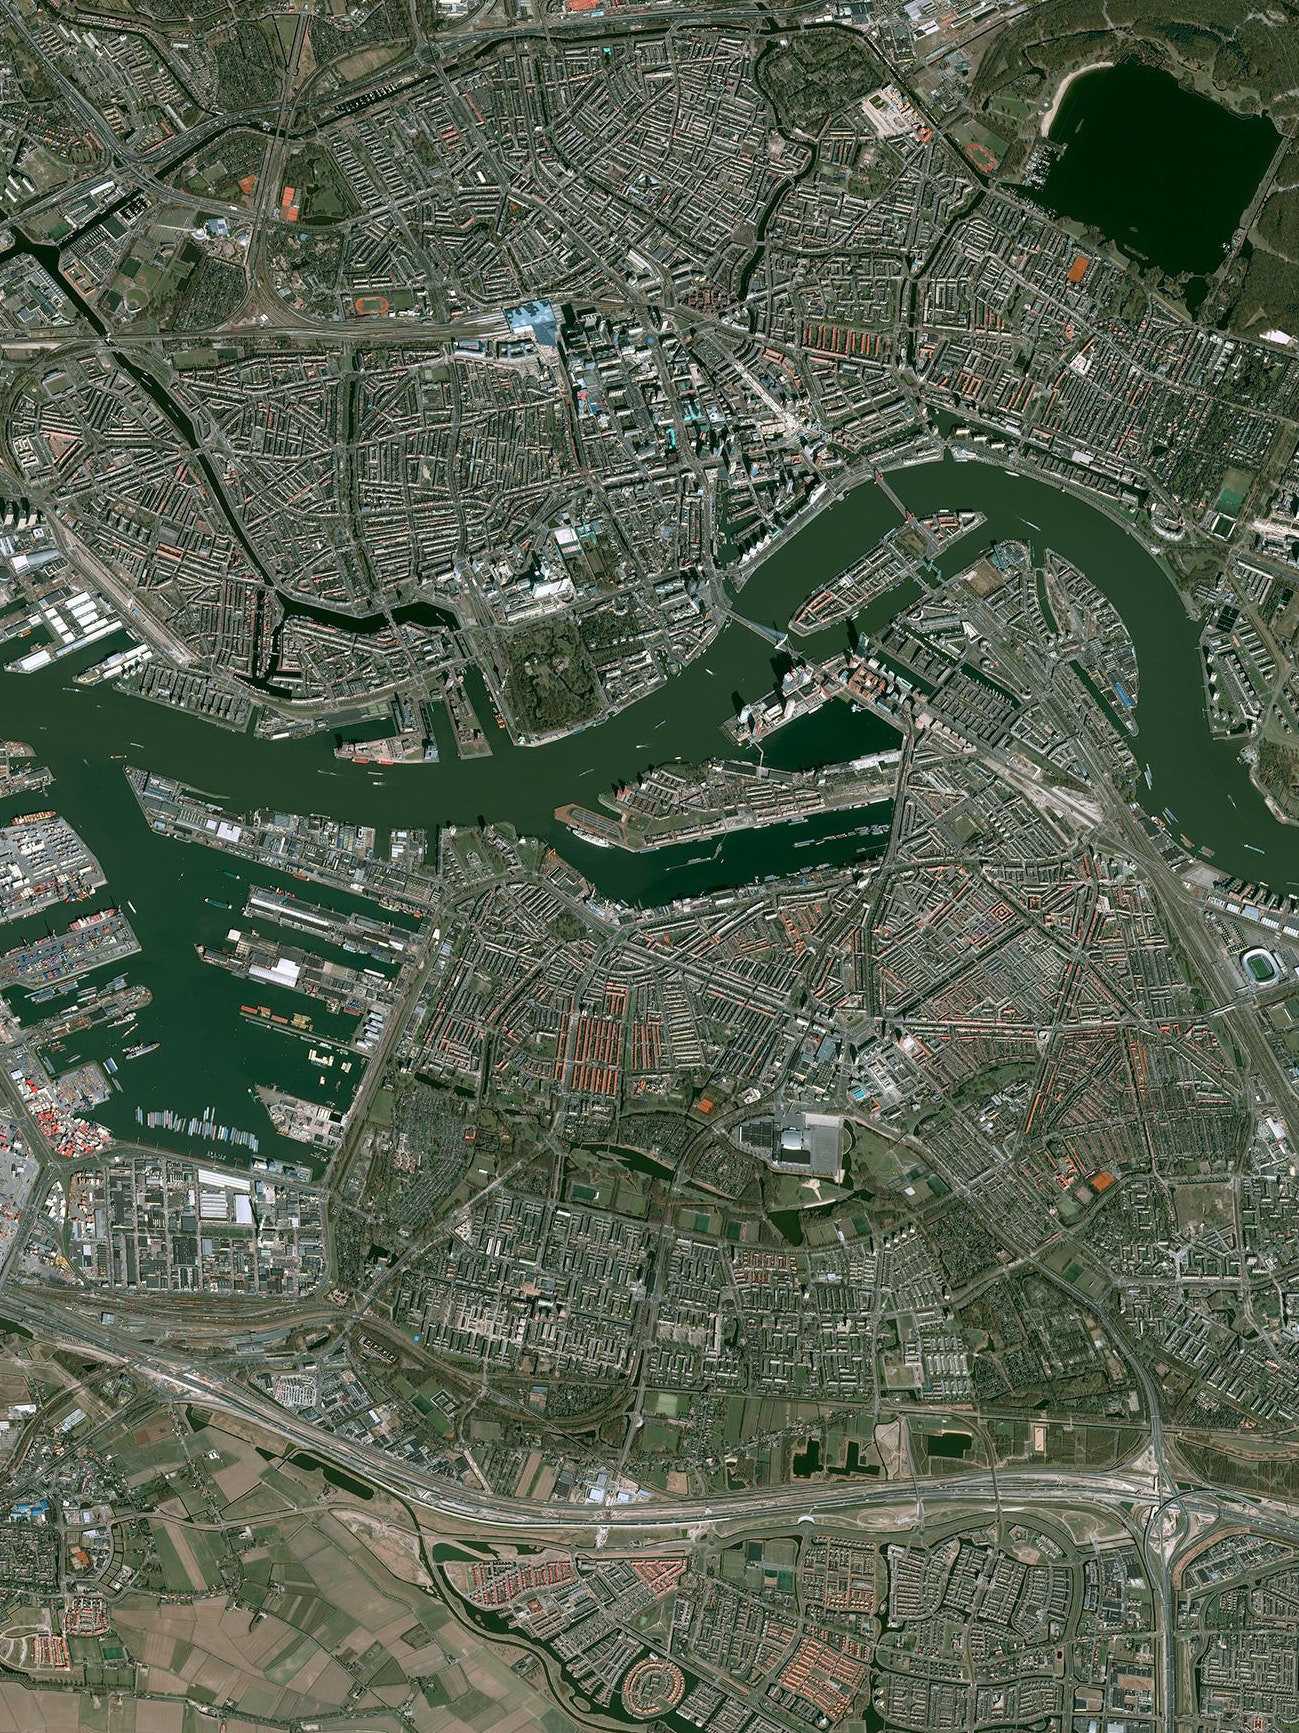 The Pleiades 1-A satellite image of Rotterdam.